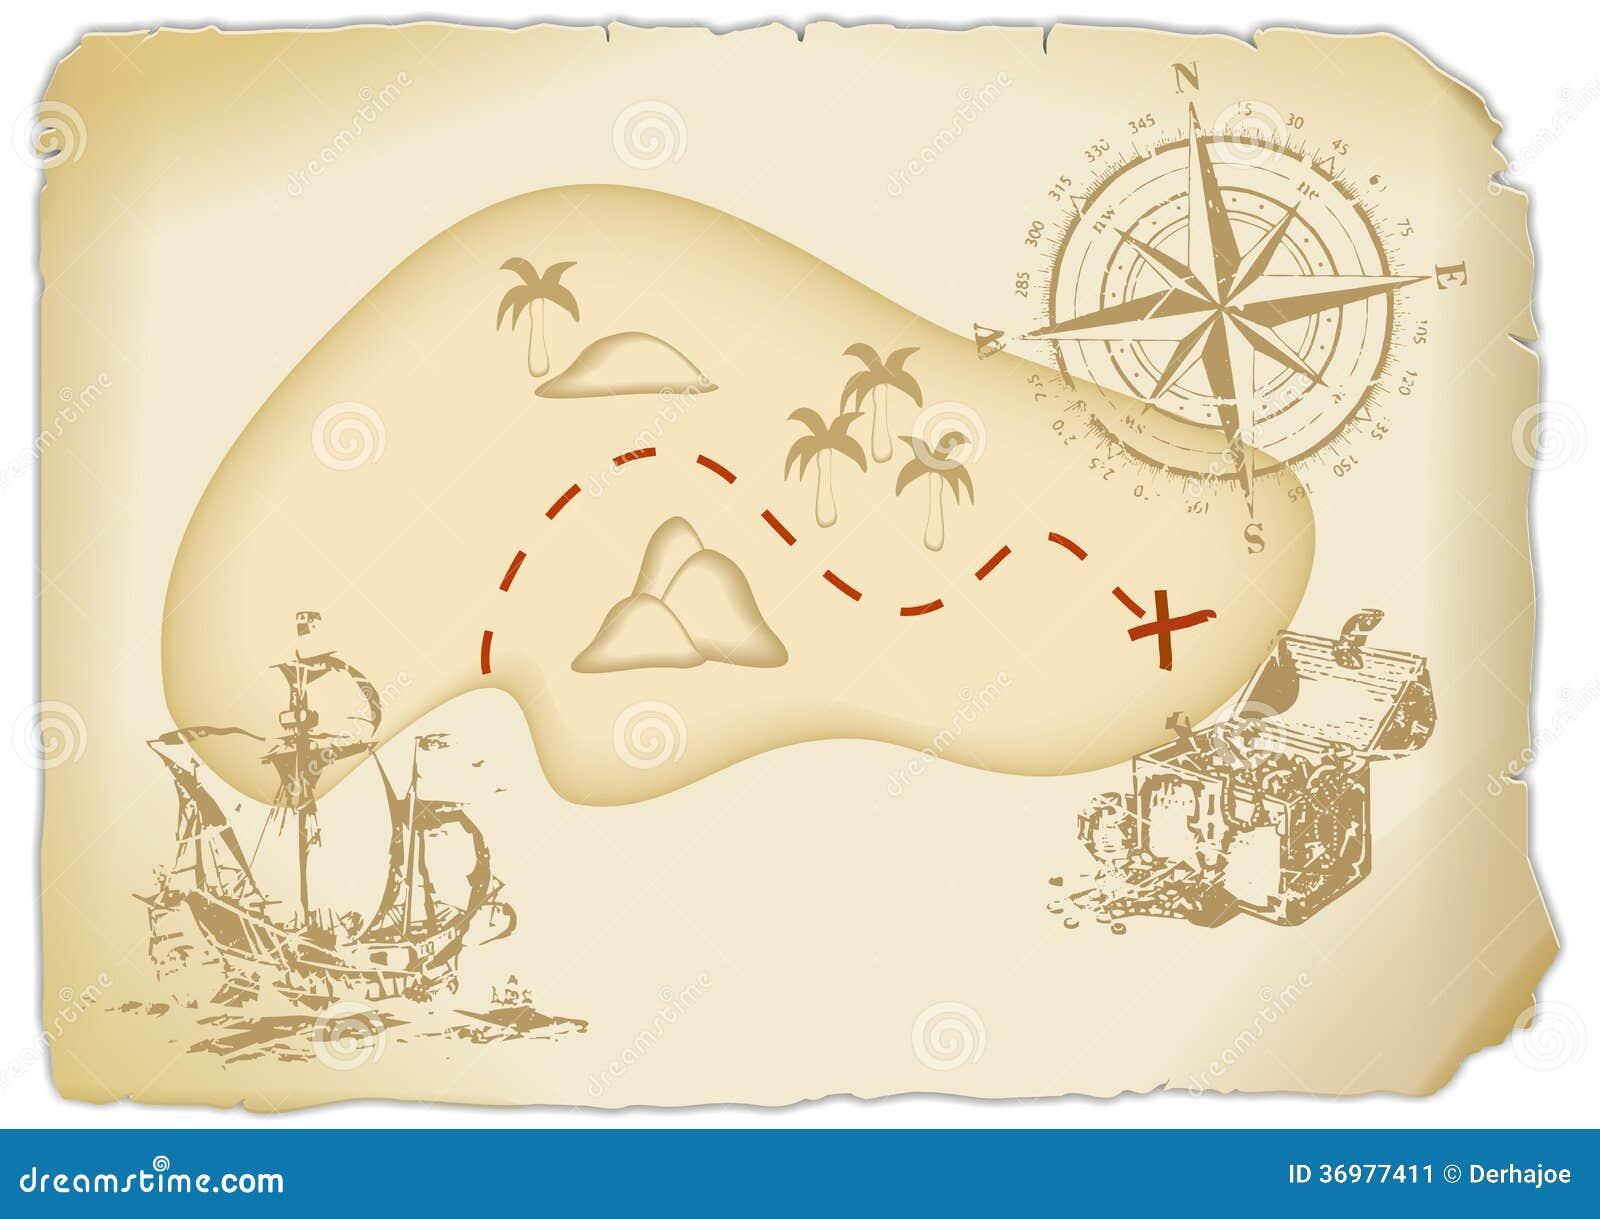 treasure map stock illustration illustration of boat